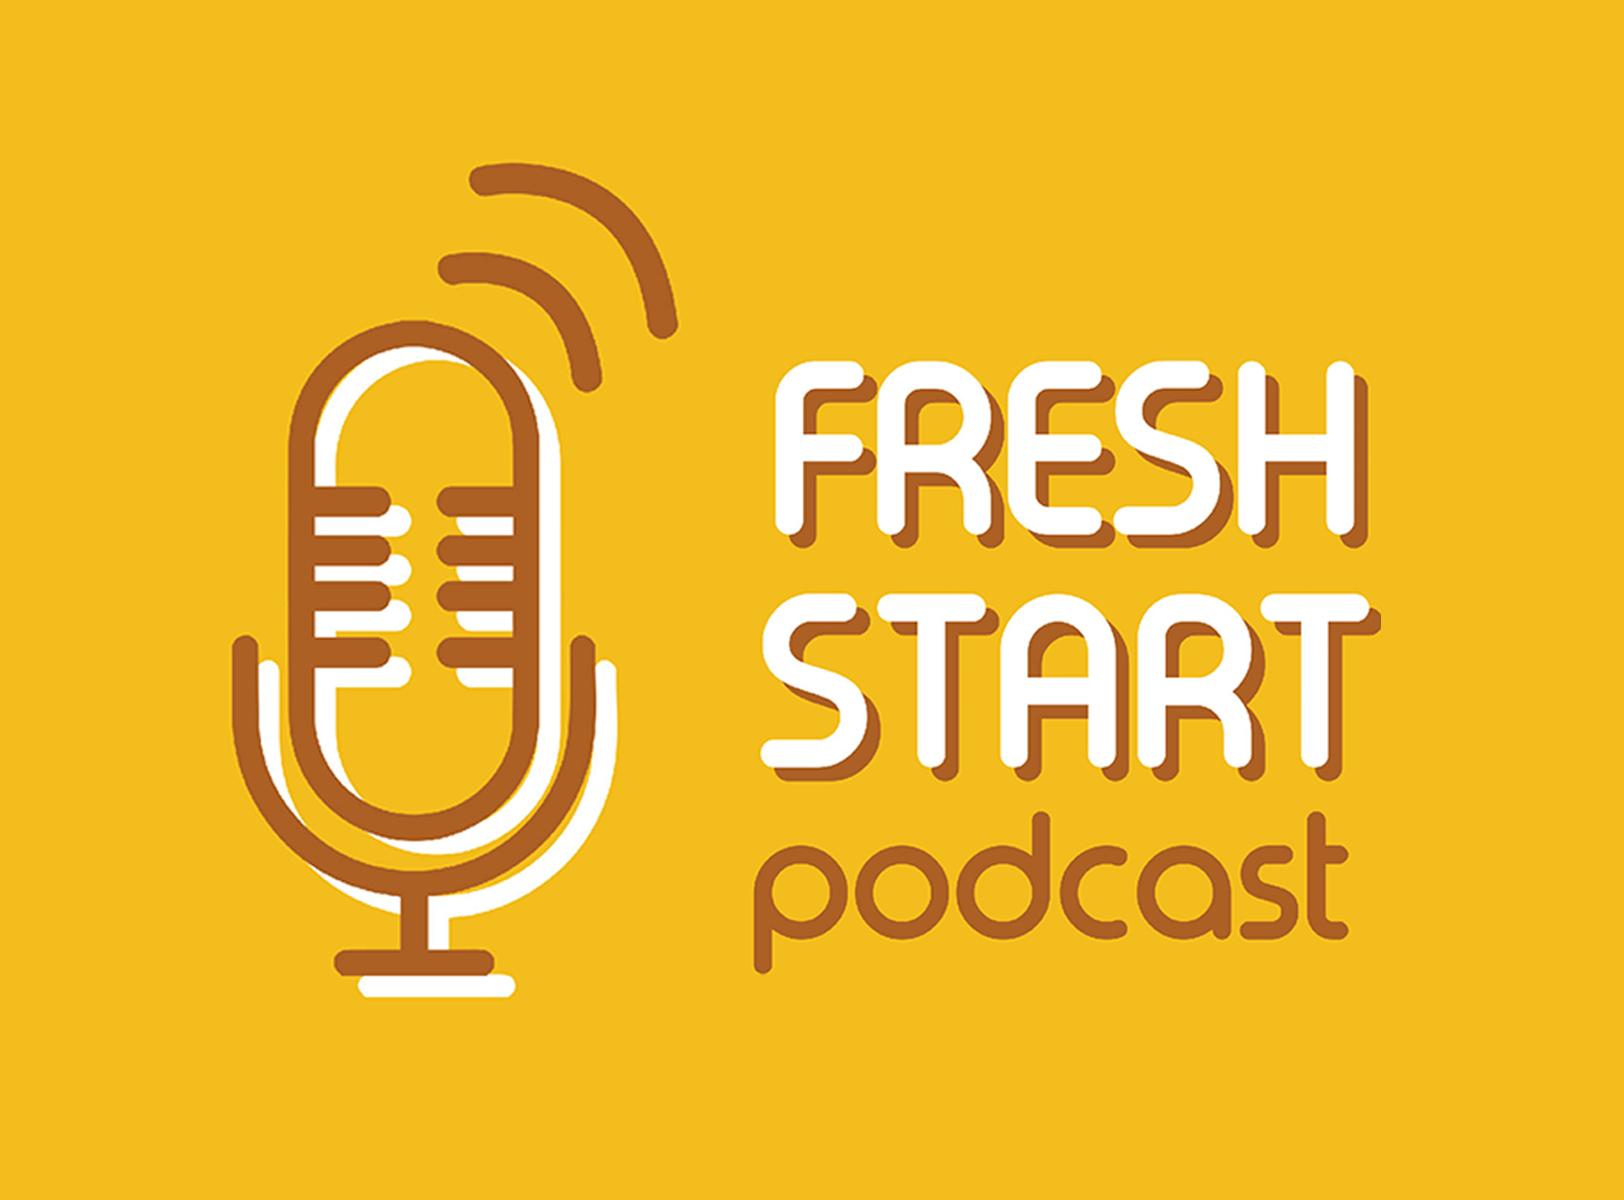 Fresh Start: Podcast News (4/19/2019 Fri.)